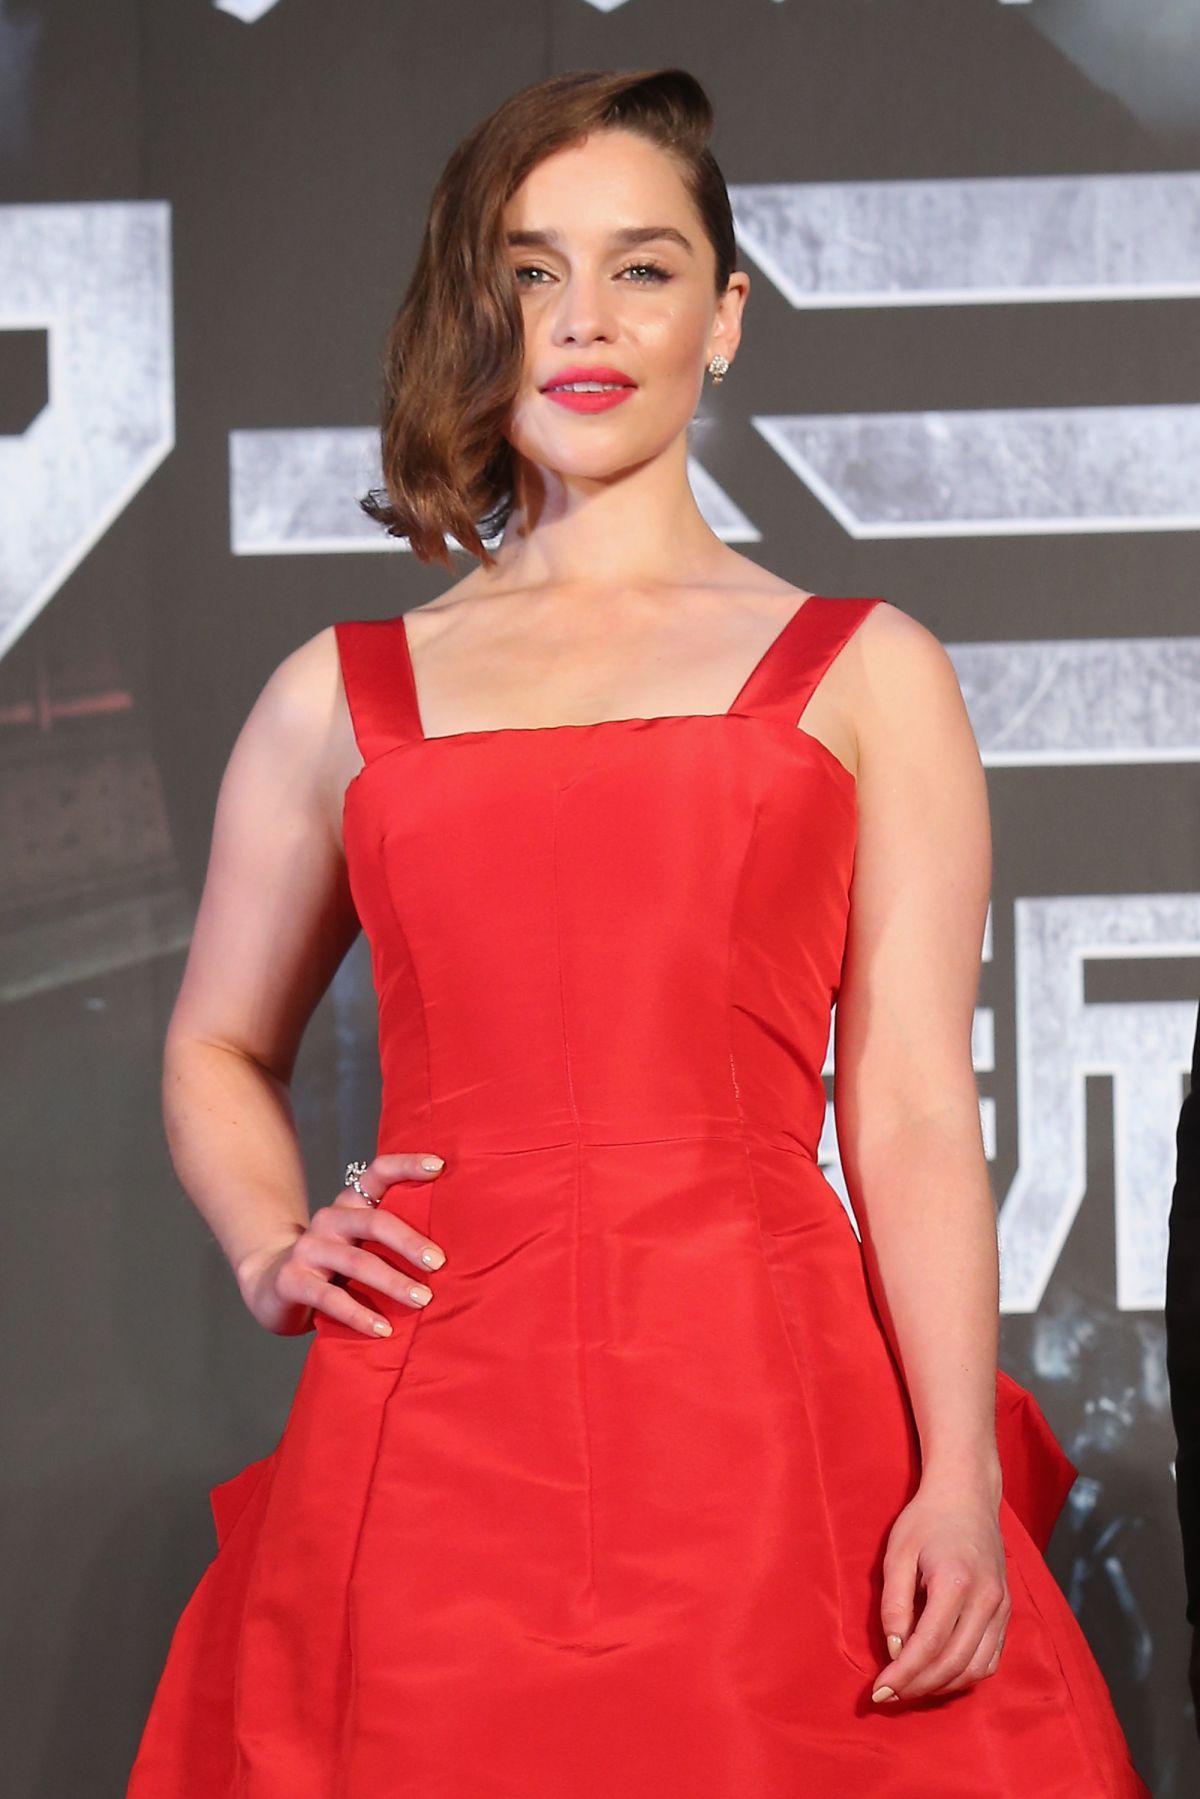 EMILIA CLARKE at Terminator: Genisys Premiere in Tokyo - HawtCelebs ...